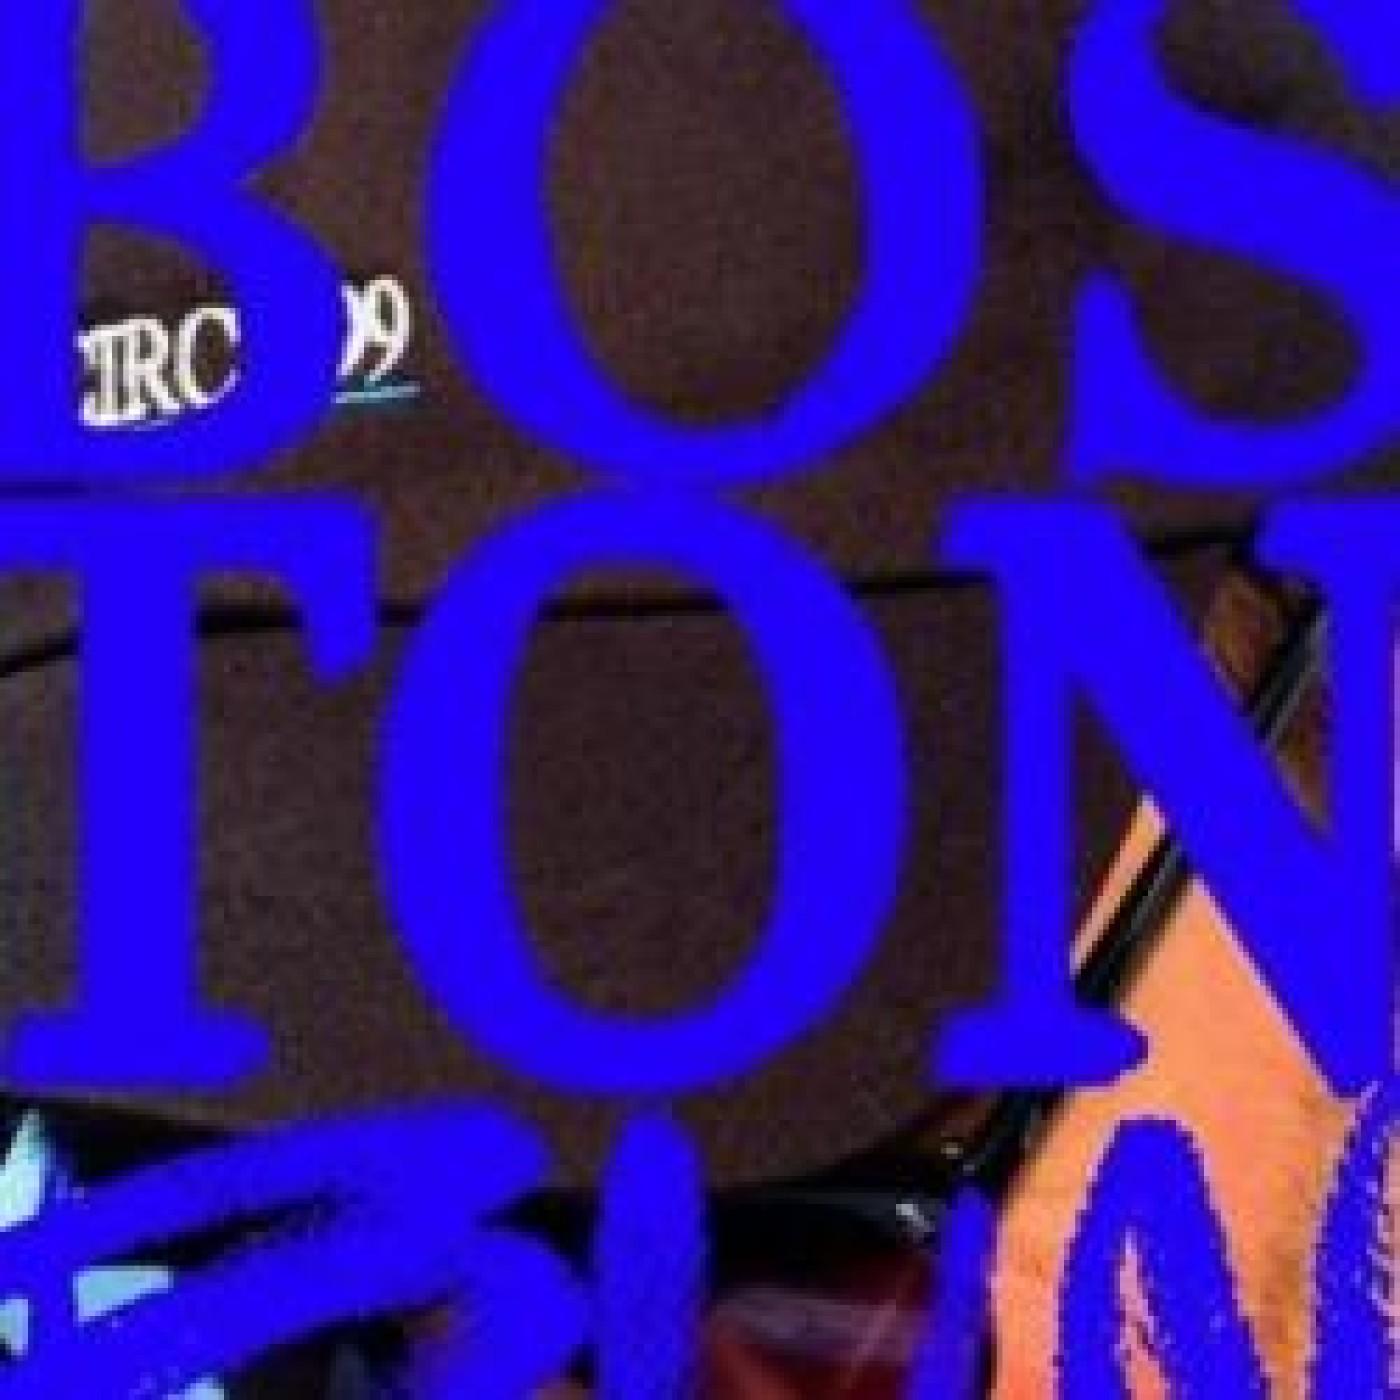 COURS D'ELECTRO BOSTON BUN